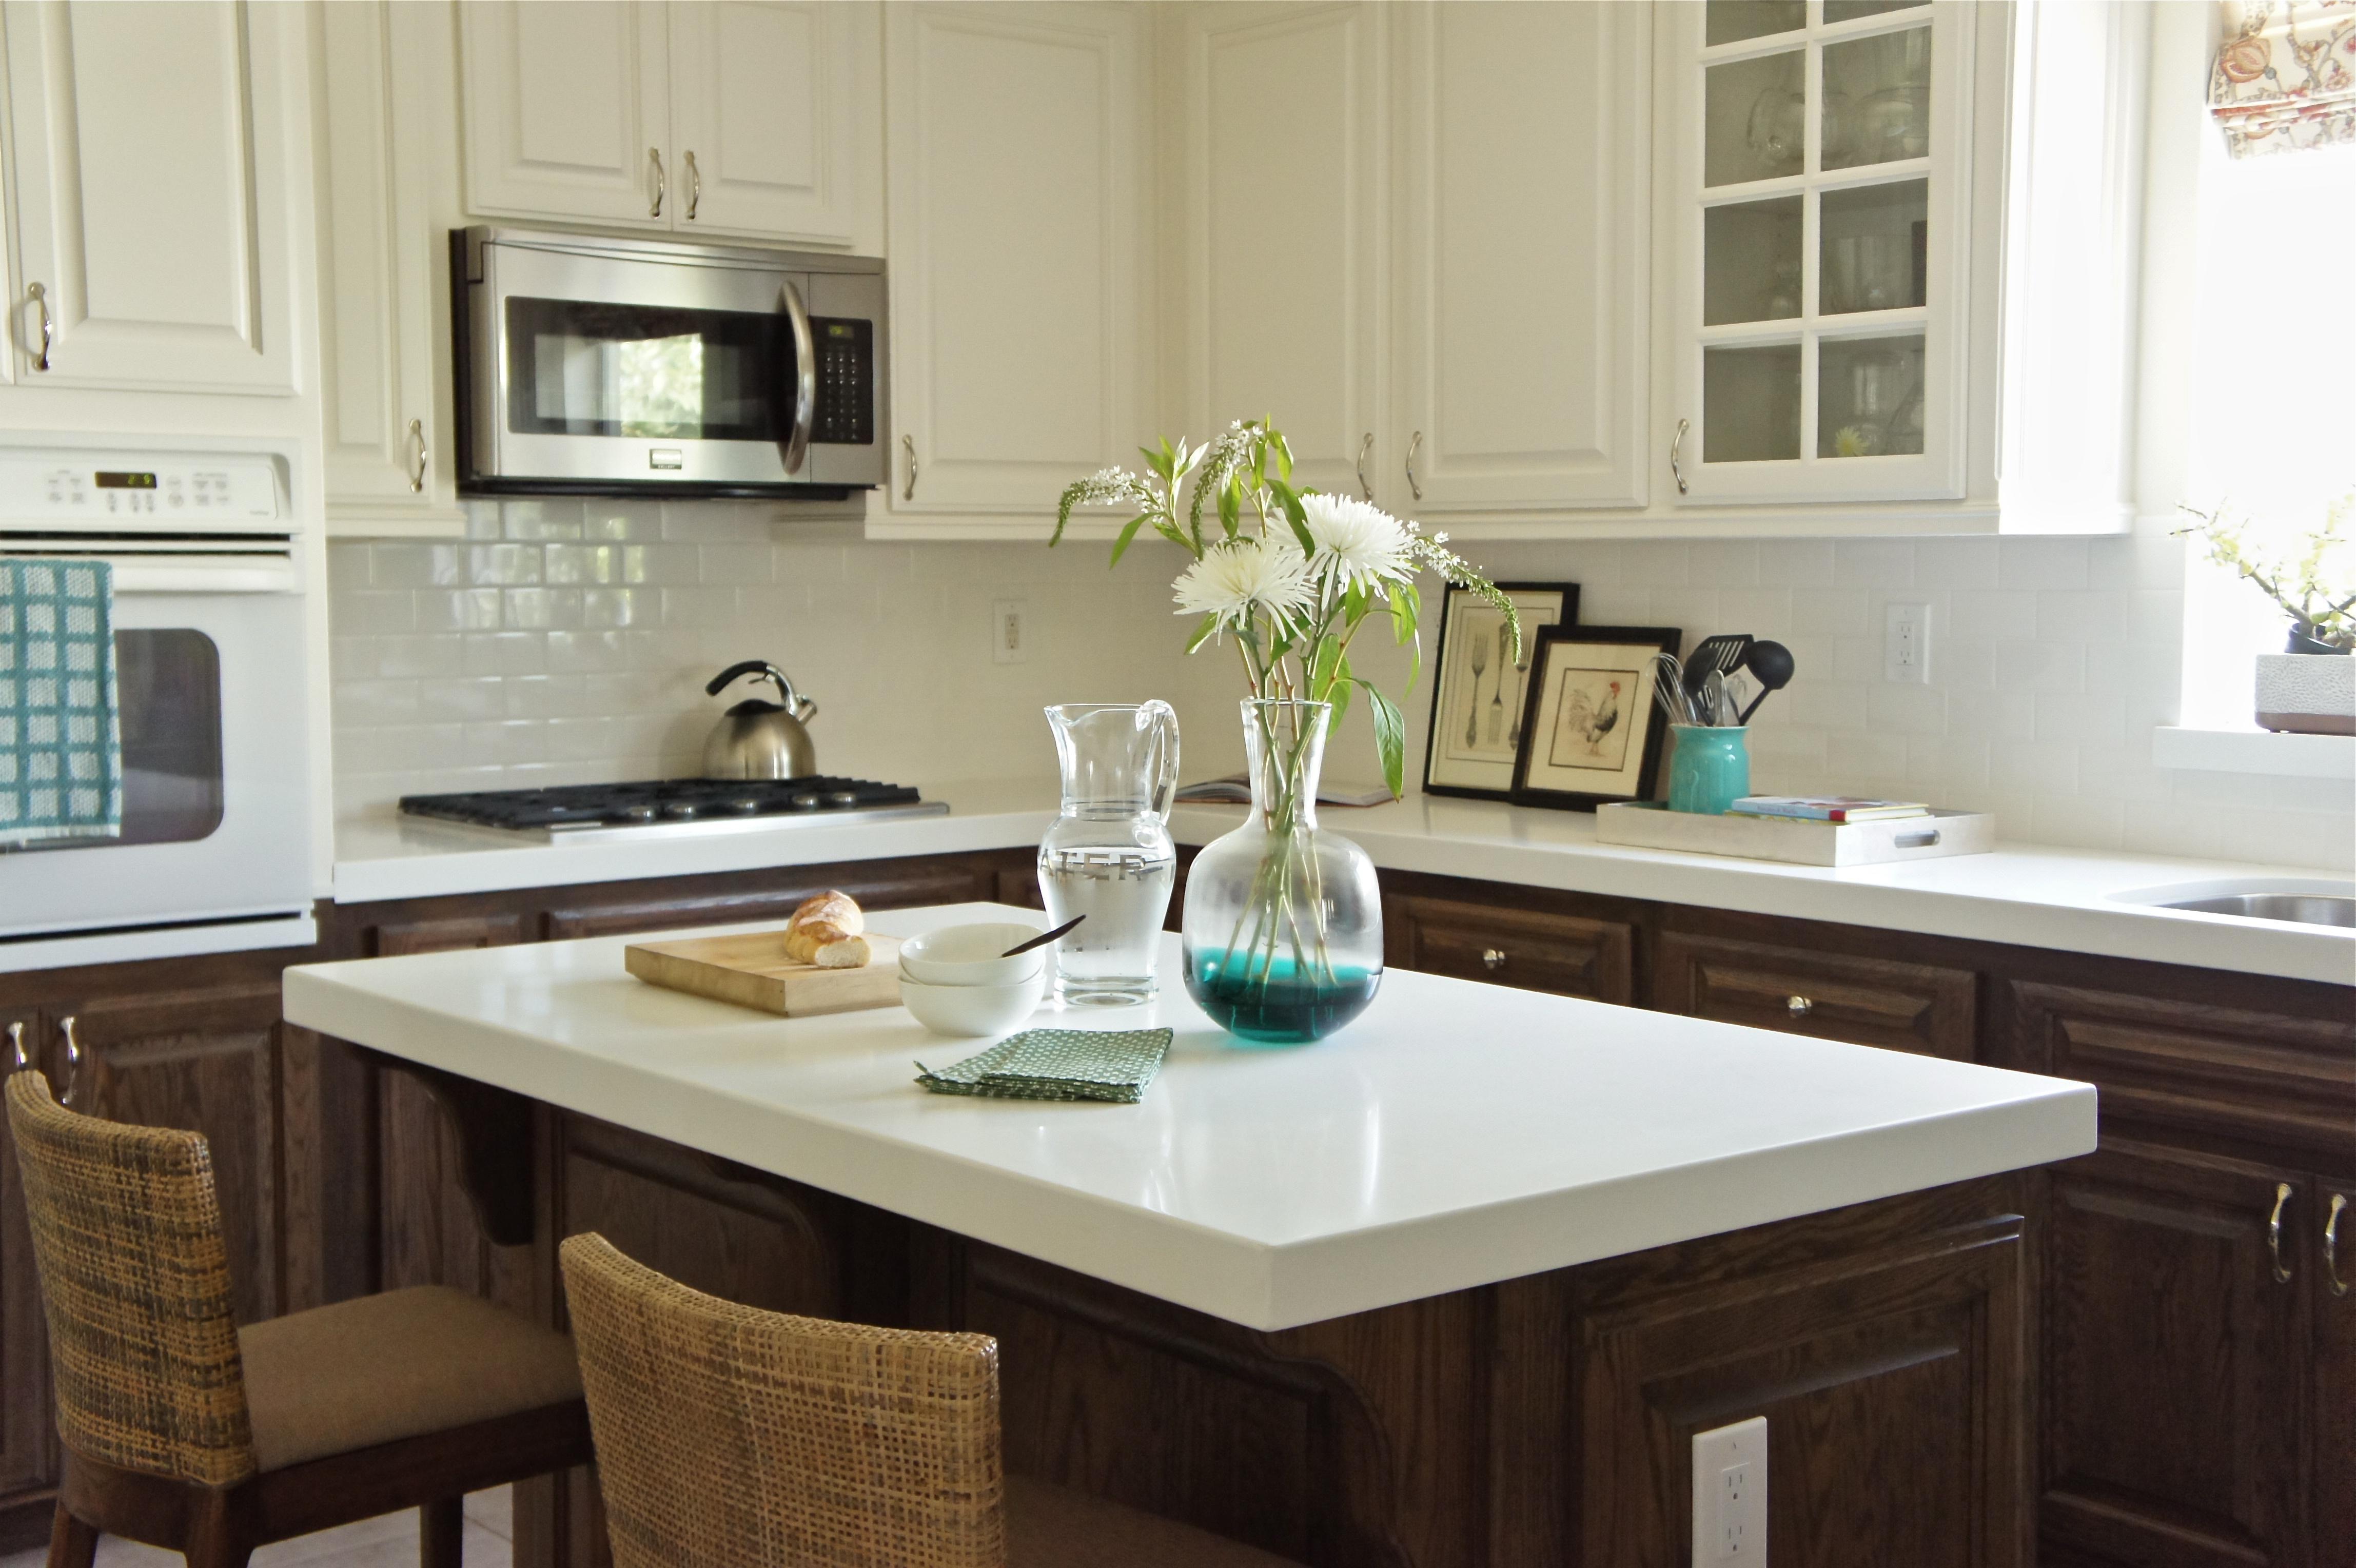 Adding Cabinets Above Kitchen Cabinet Upper Building - 35 ...